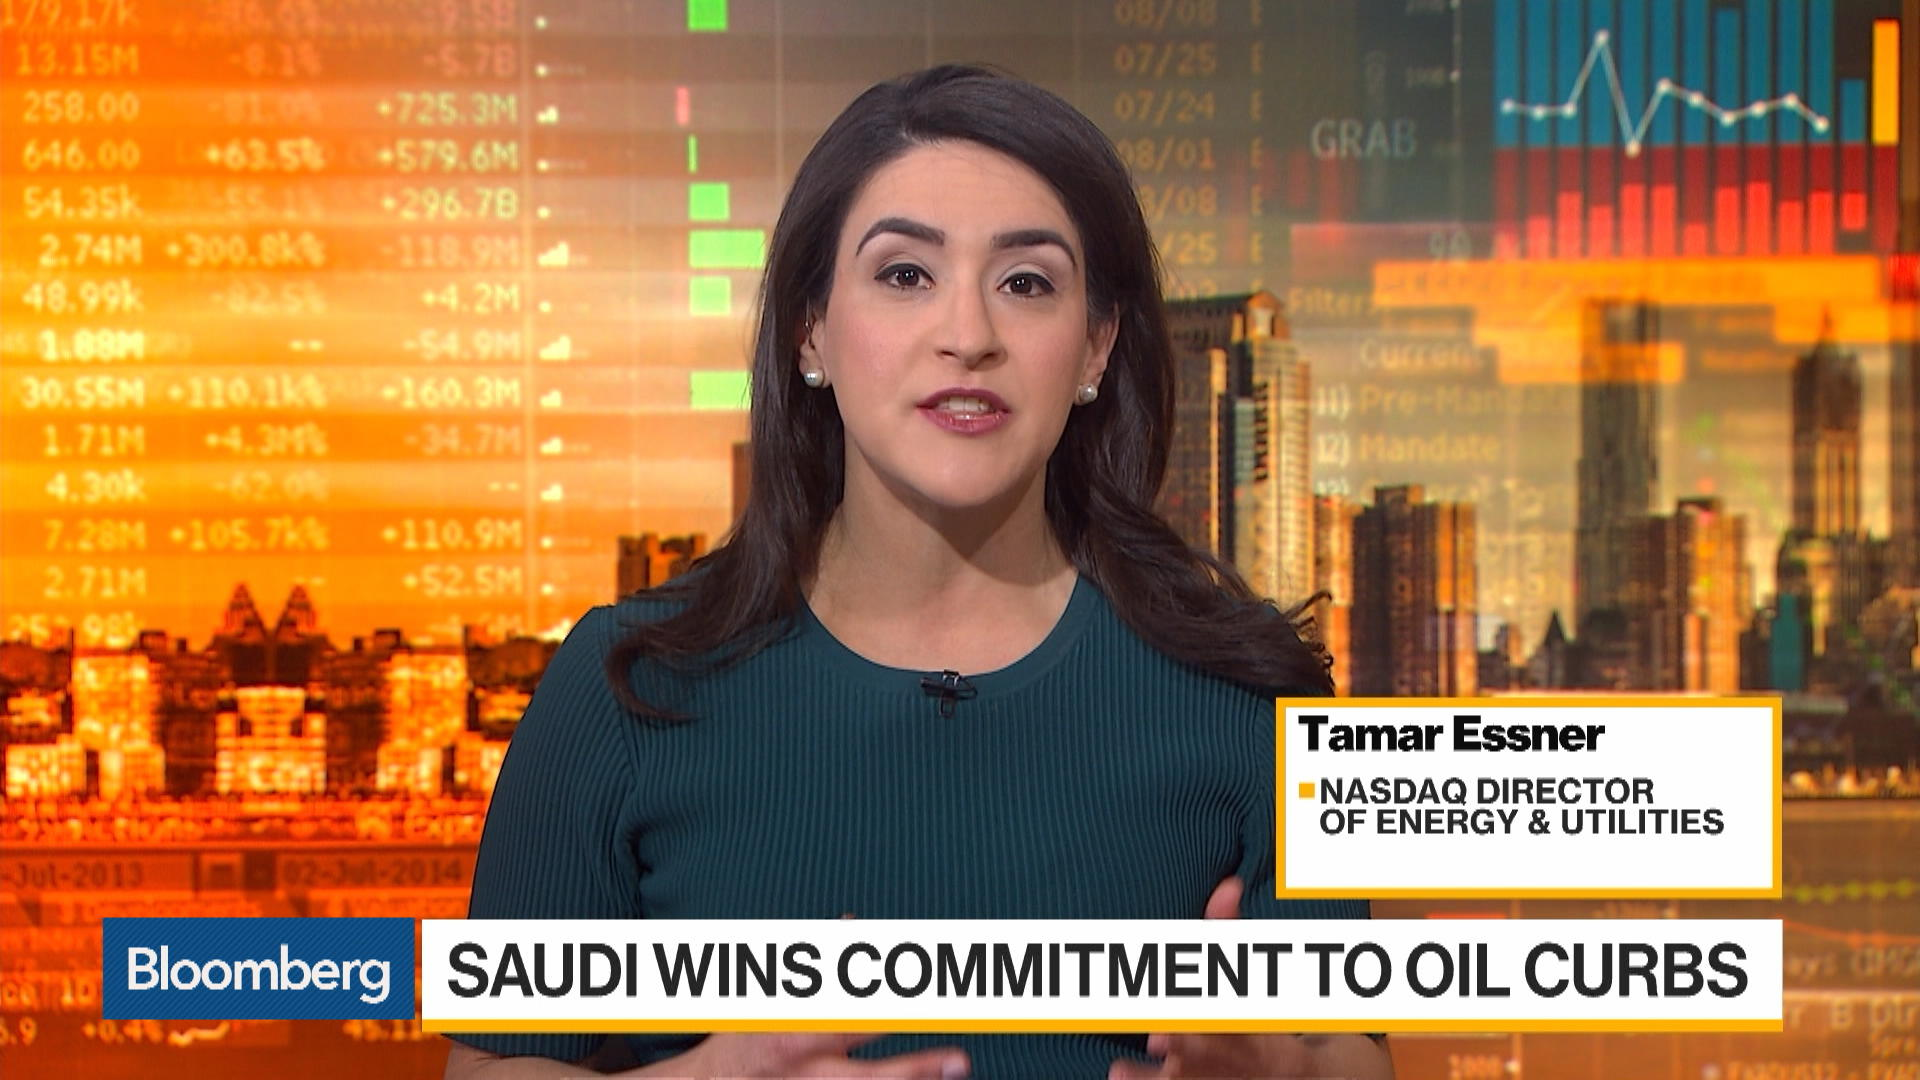 U.S.'s Stance on Iran and Venezuela to Affect OPEC Policy, Nasdaq's Essner Says